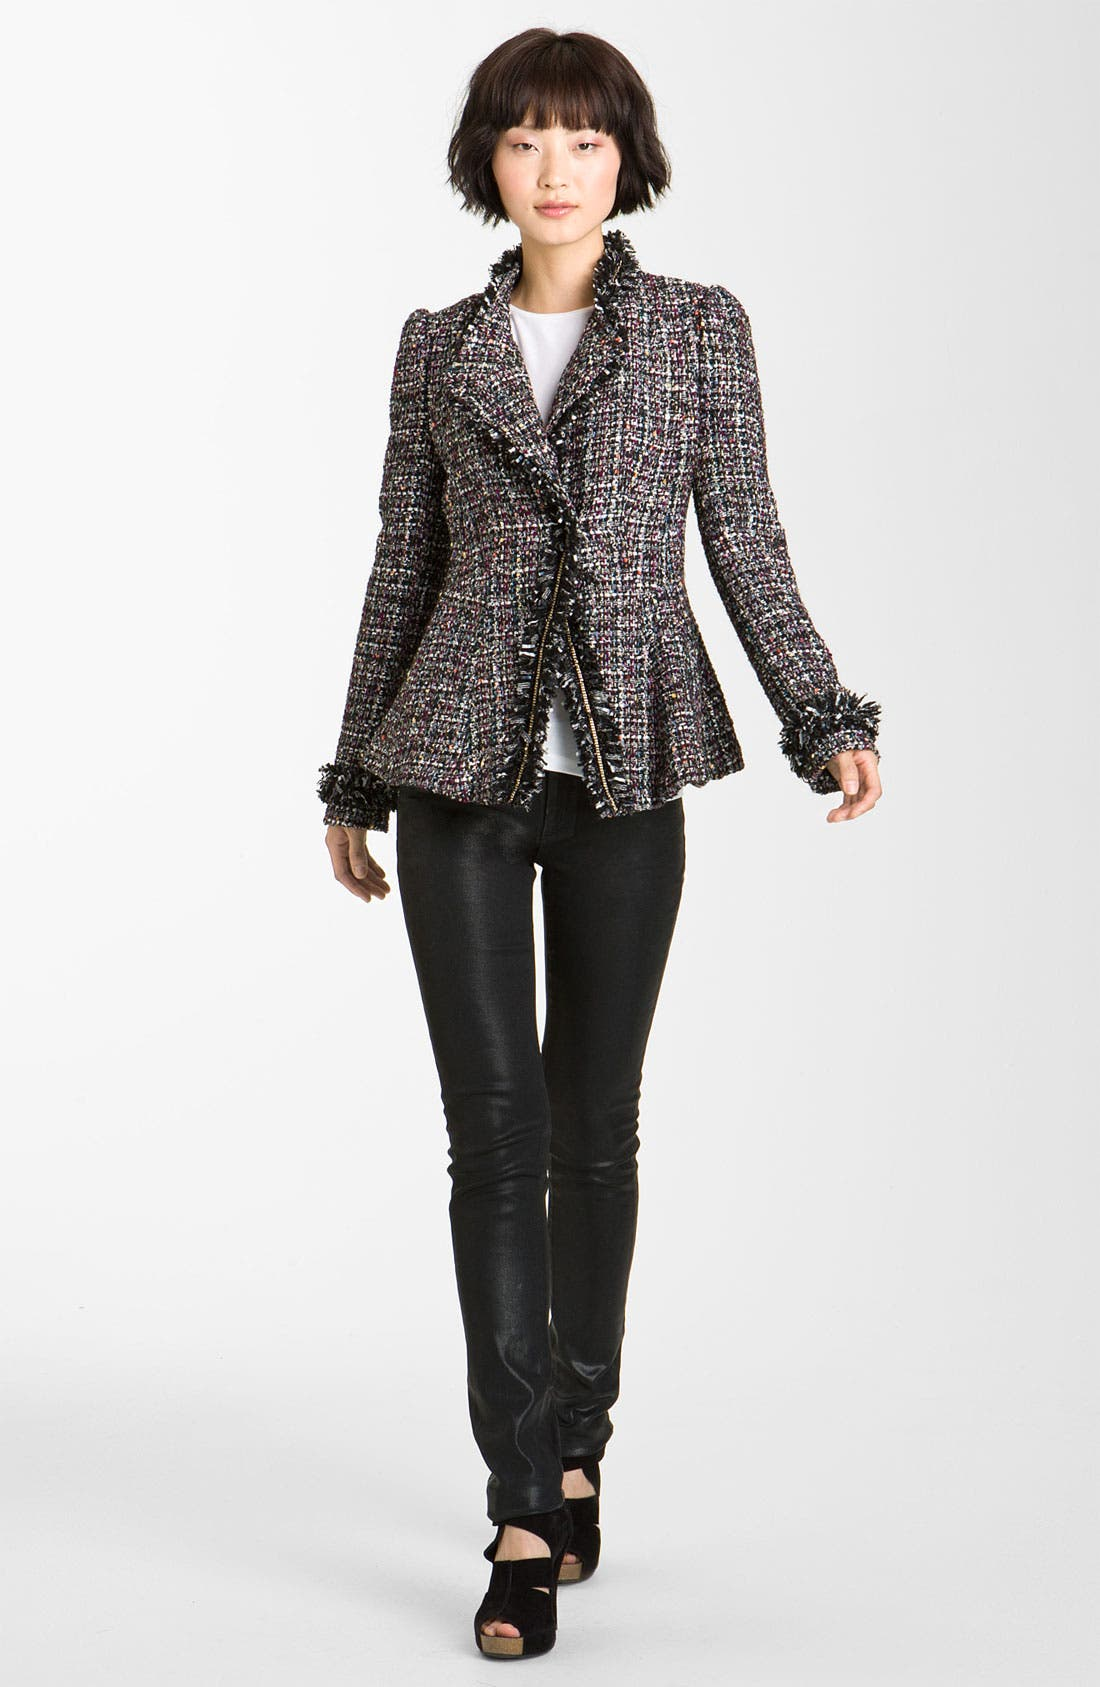 Alternate Image 1 Selected - Mcginn Asymmetrical Metallic Tweed Jacket